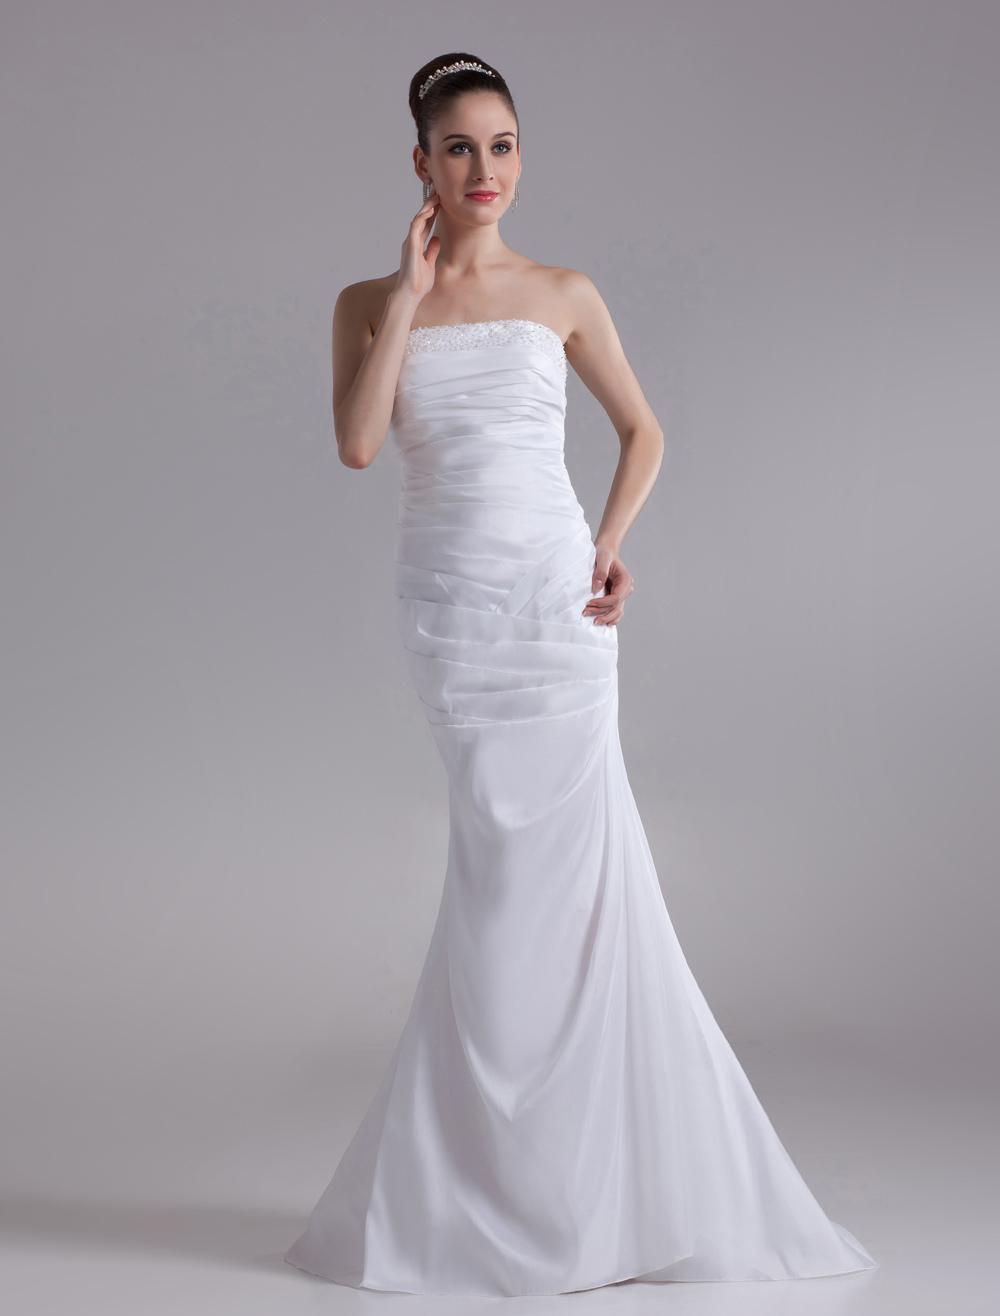 White Mermaid Strapless Beading Taffeta Wedding Dress For Bride photo